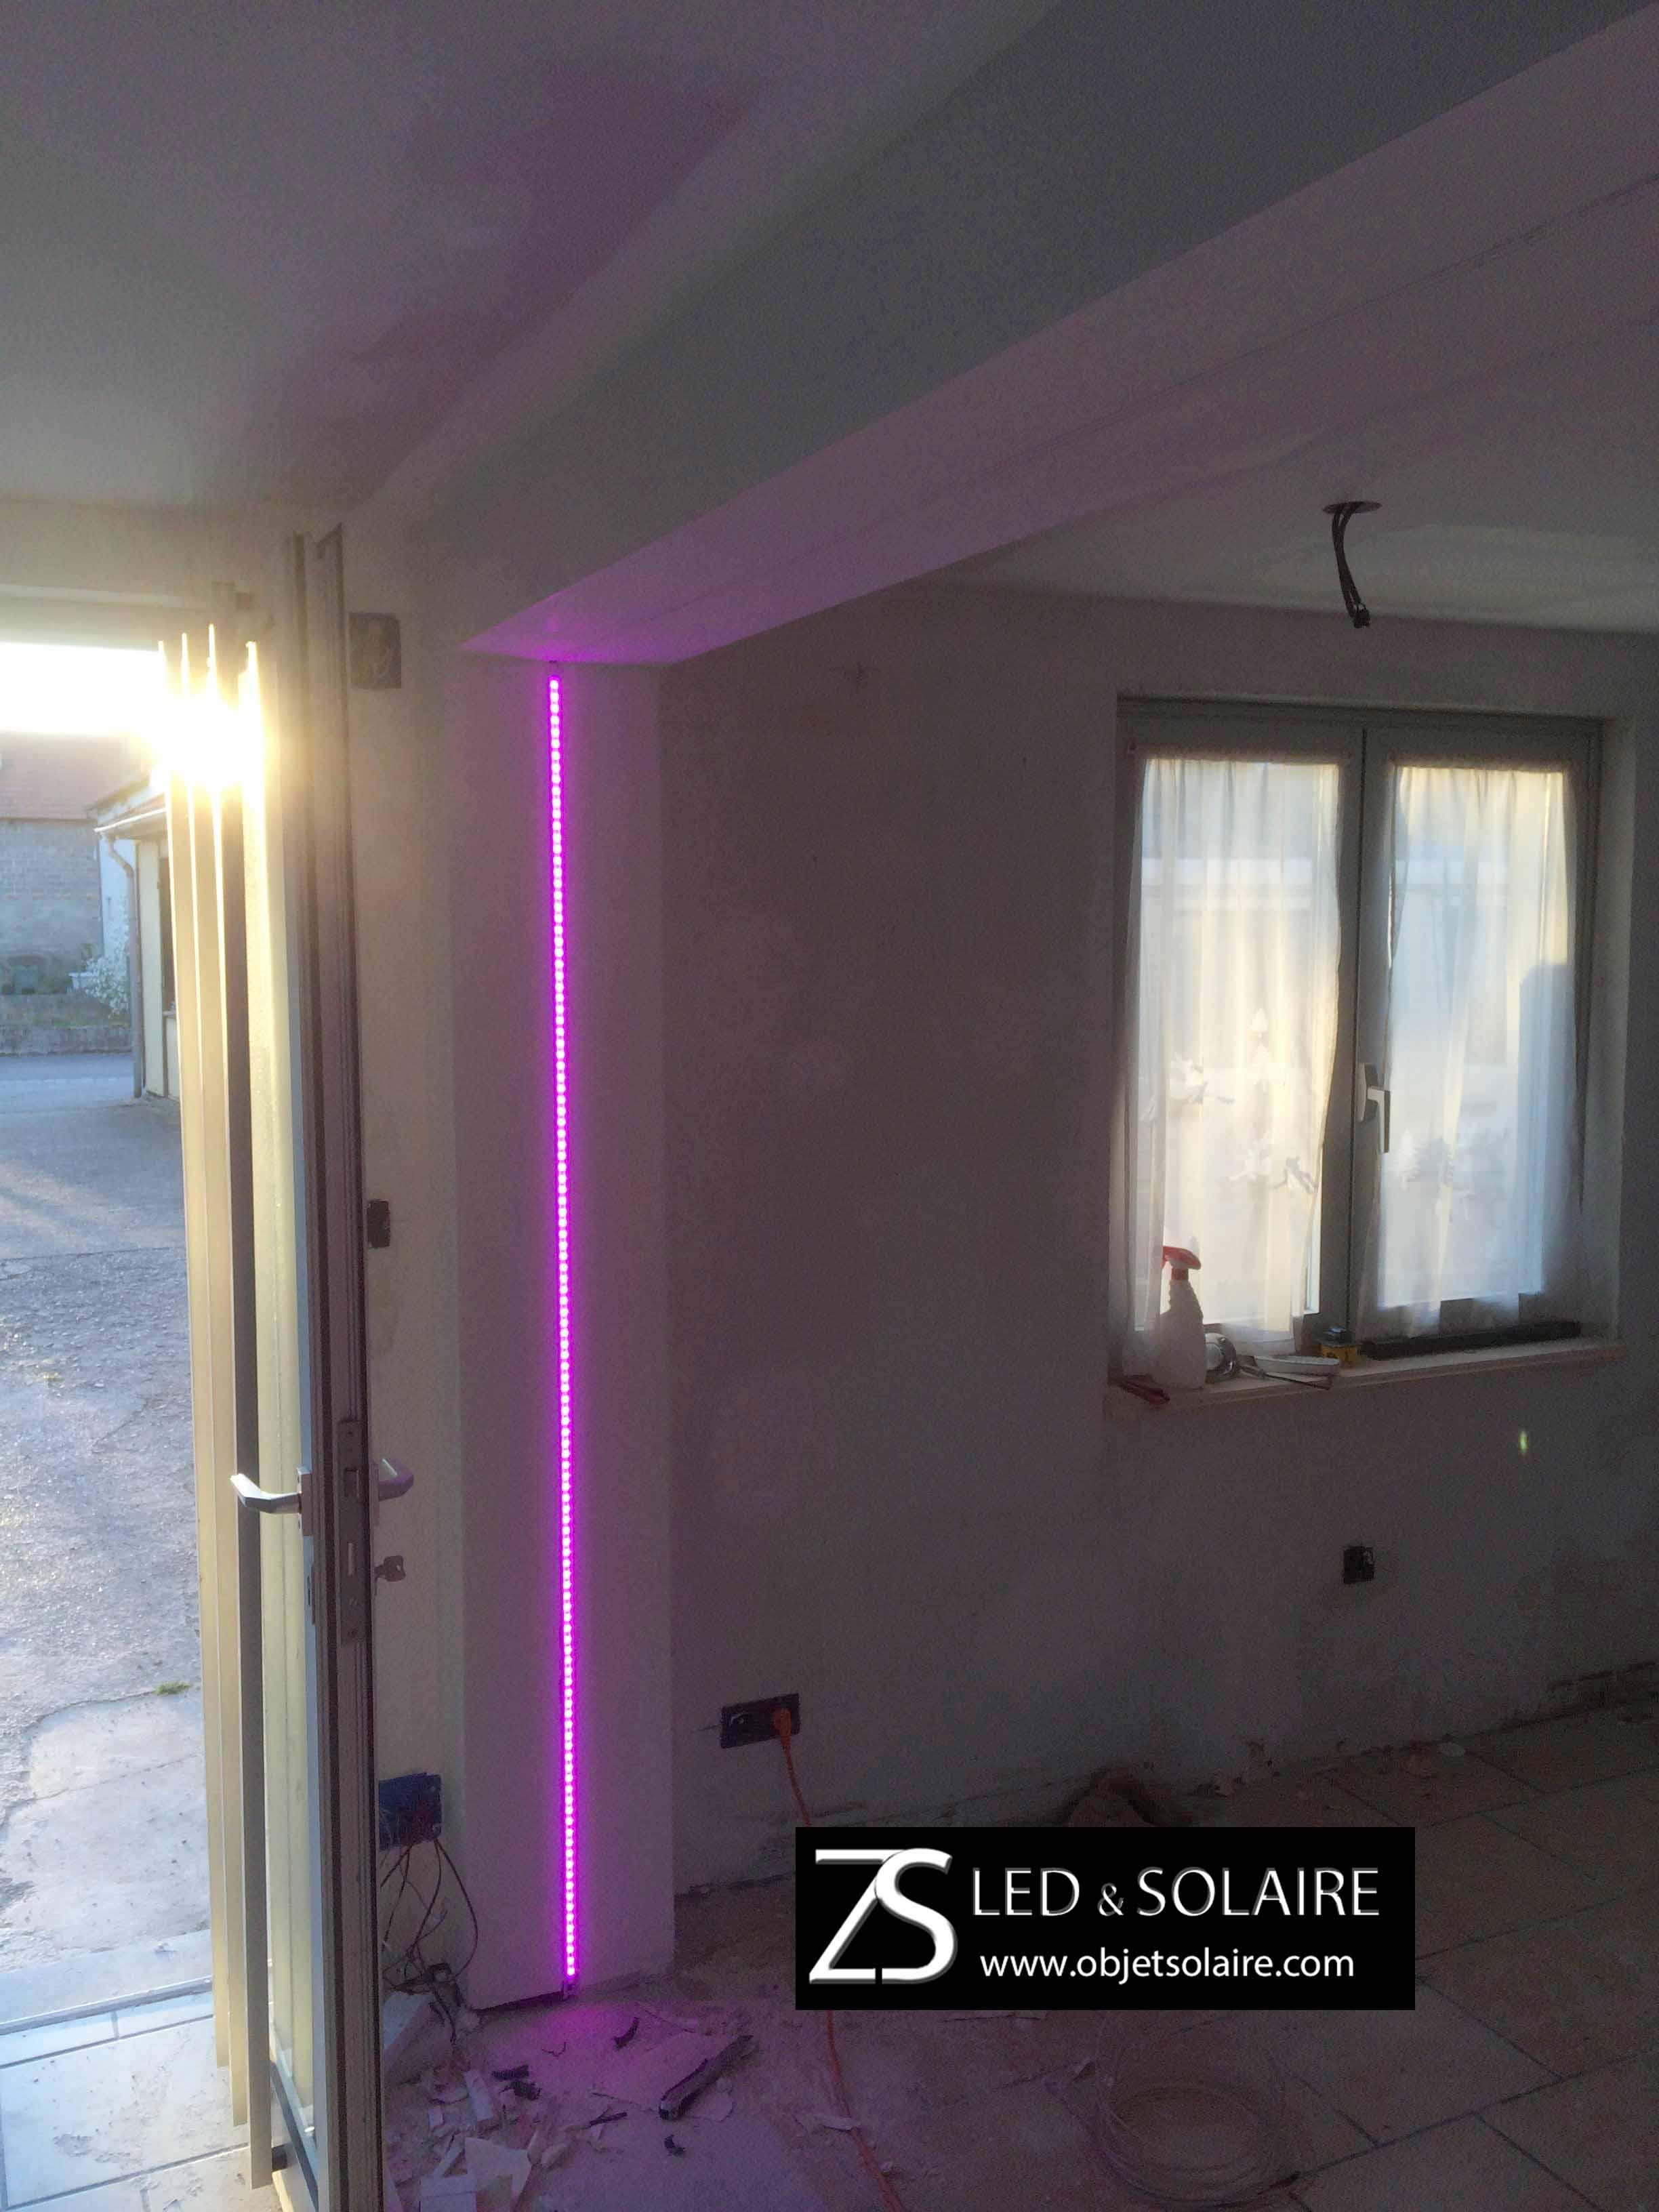 ruban led rgb qualit professionnelle epistar 24v eclairage led objetsolaire. Black Bedroom Furniture Sets. Home Design Ideas